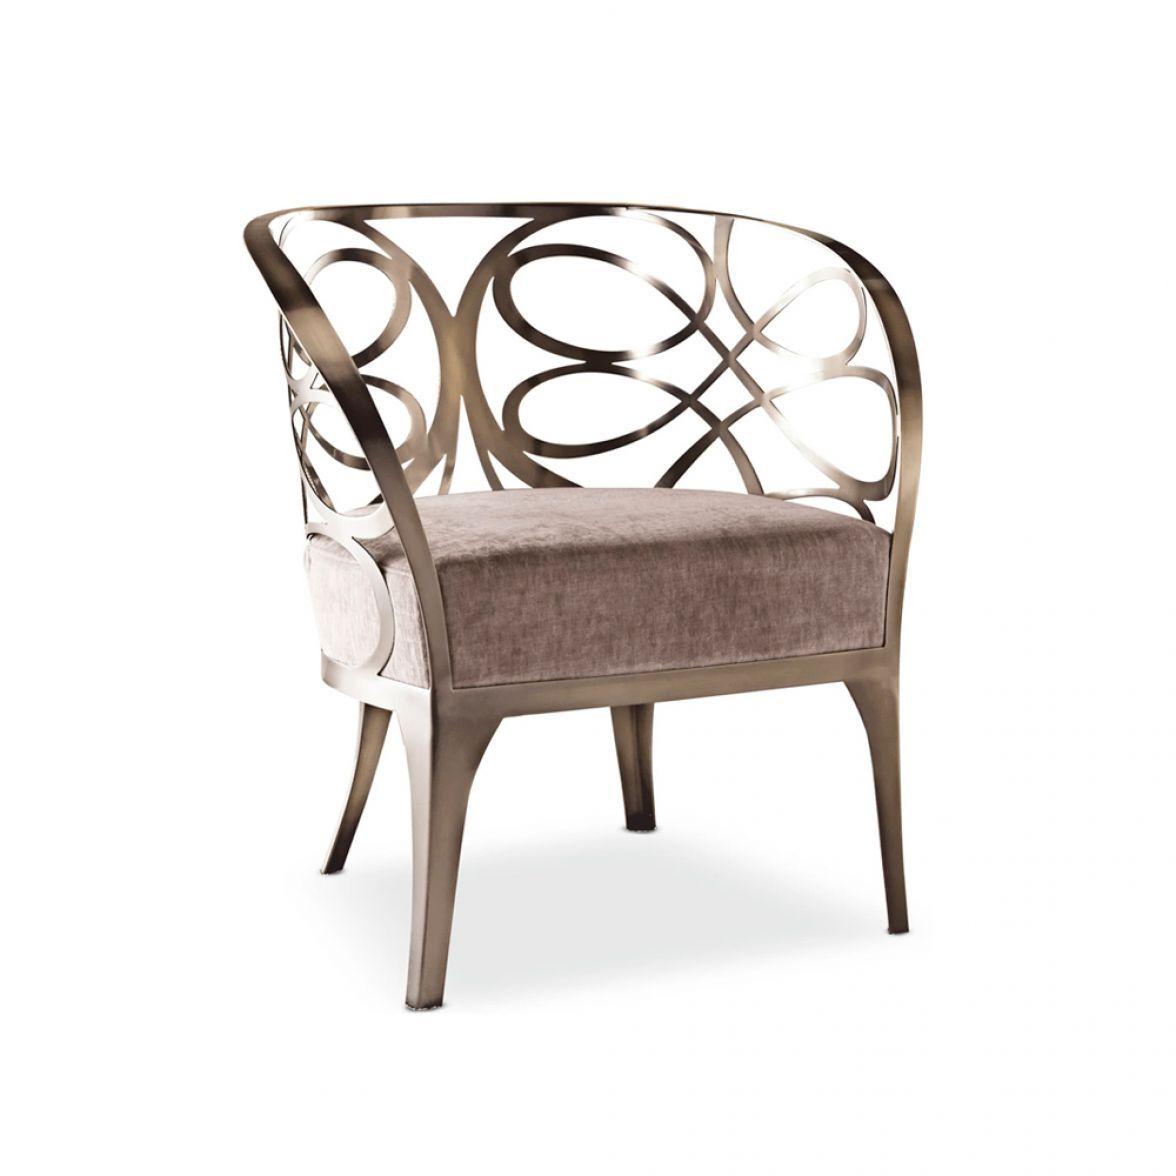 Noe armchair